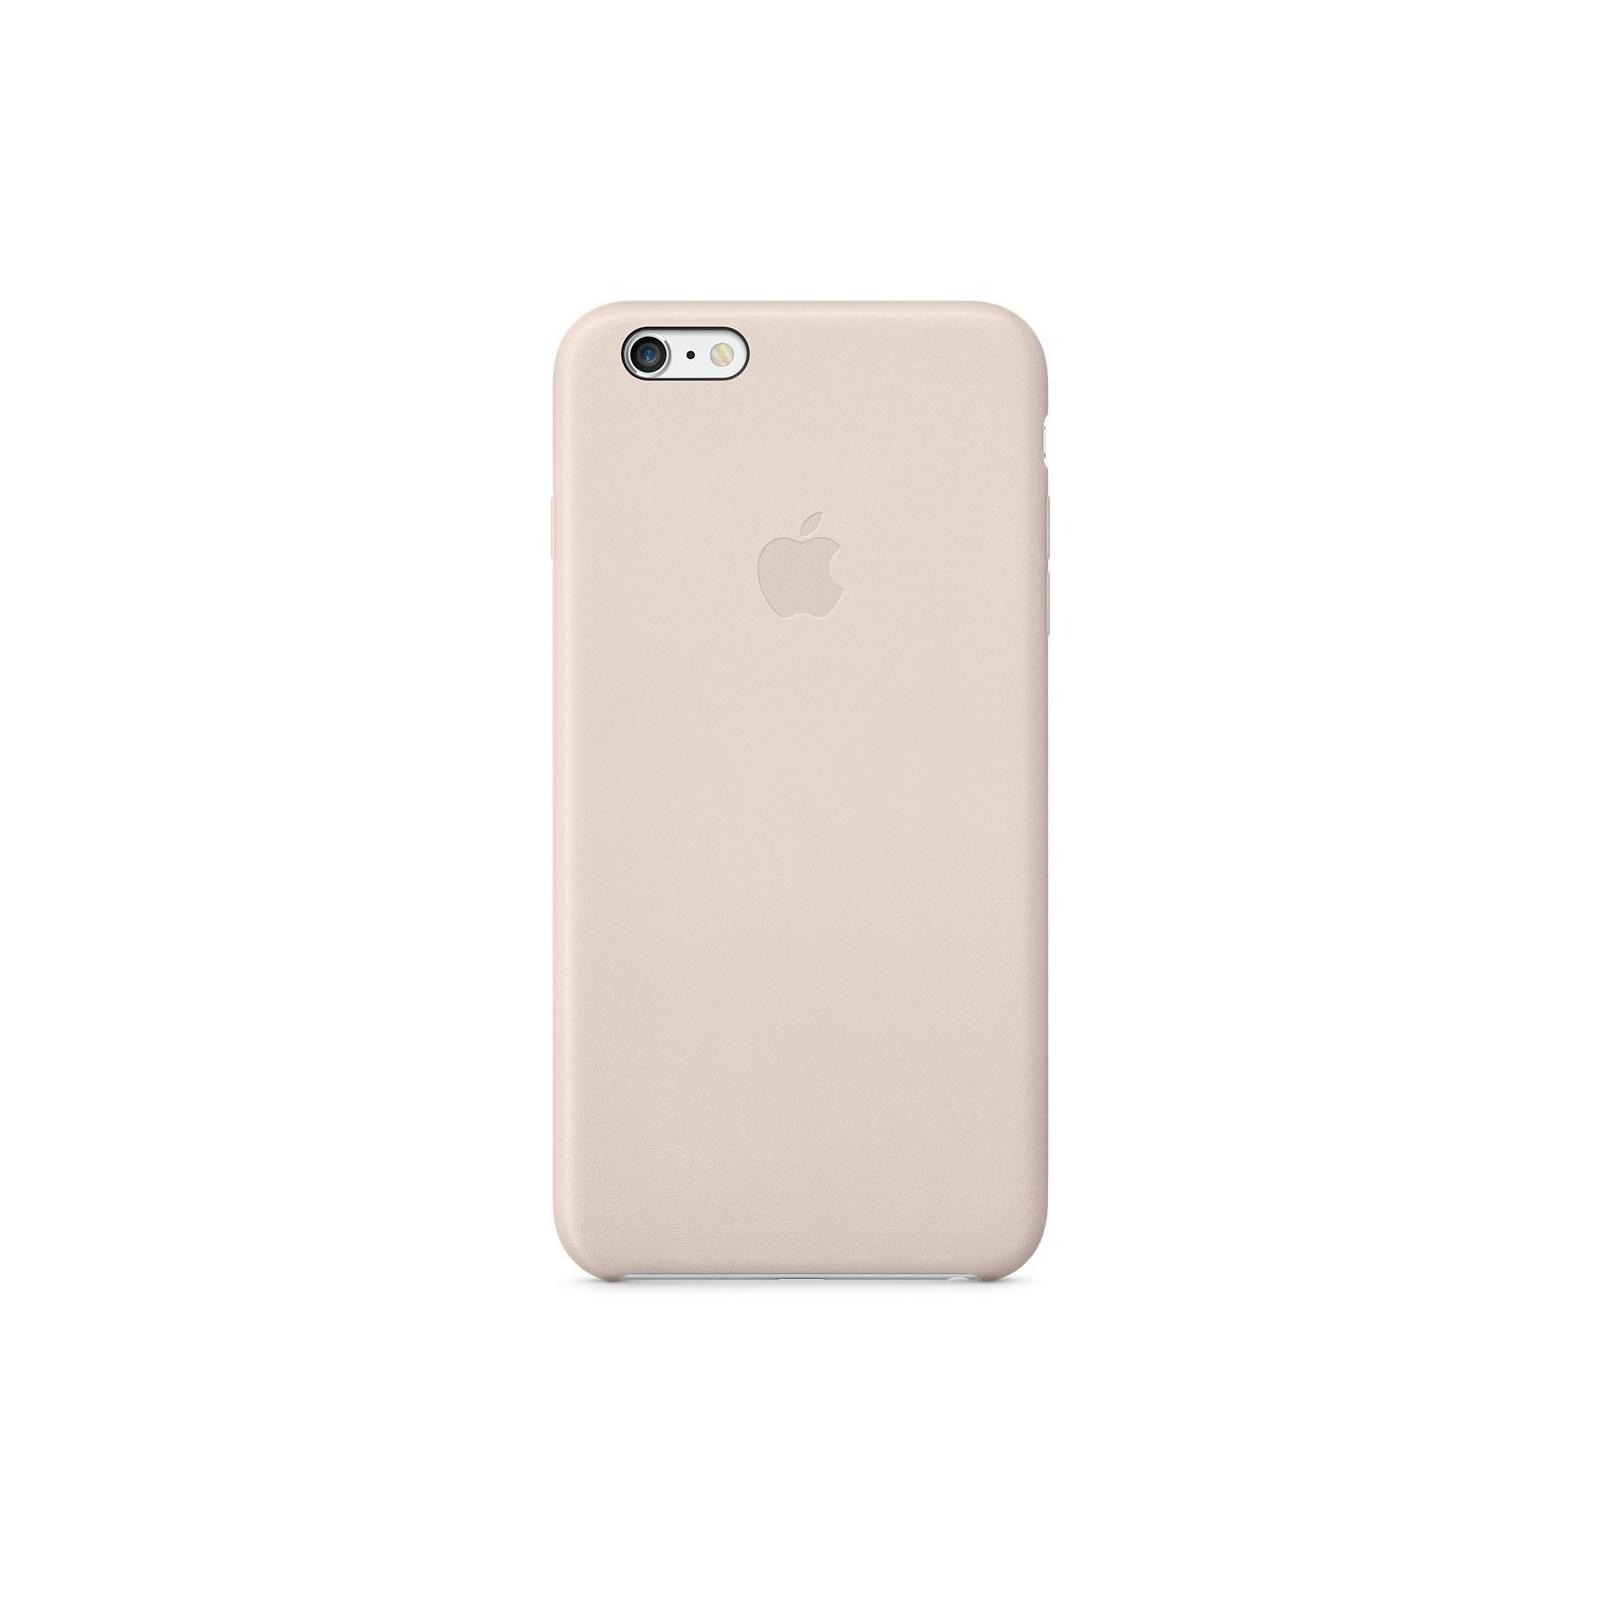 Чехол для моб. телефона Apple для iPhone 6 Plus light-pink (MGQW2ZM/A)